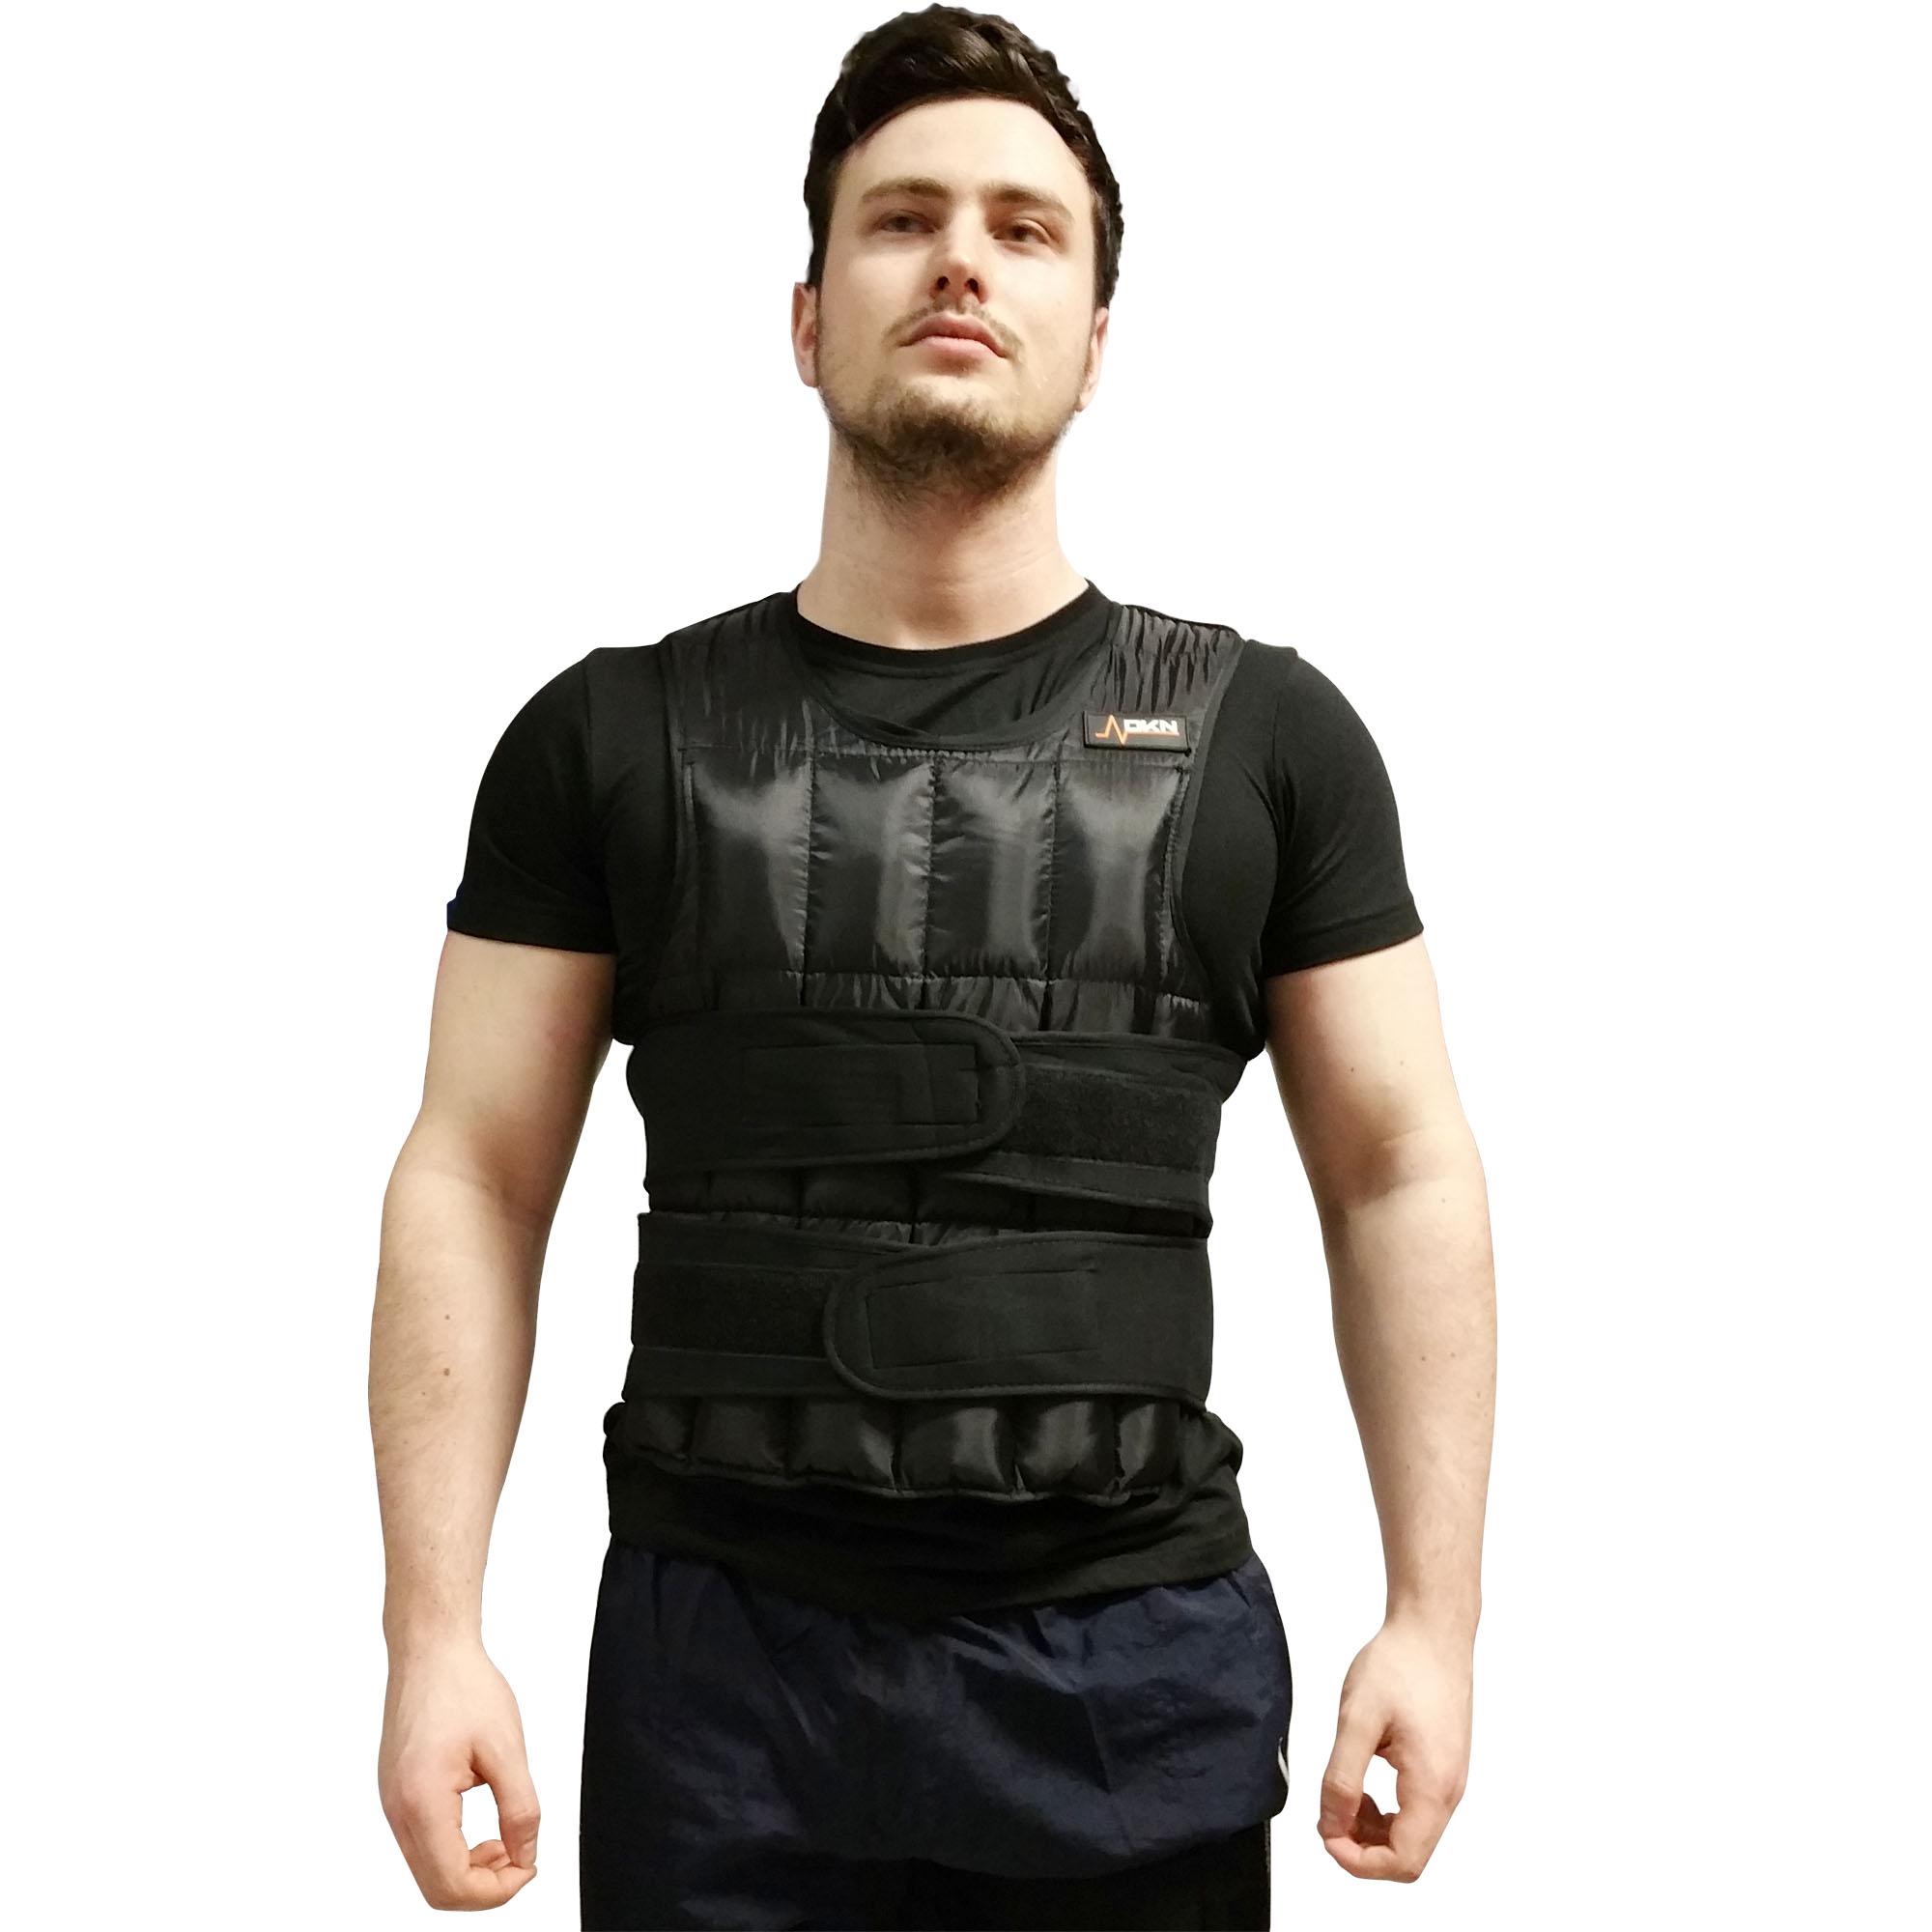 DKN 20kg Adjustable Weighted Vest